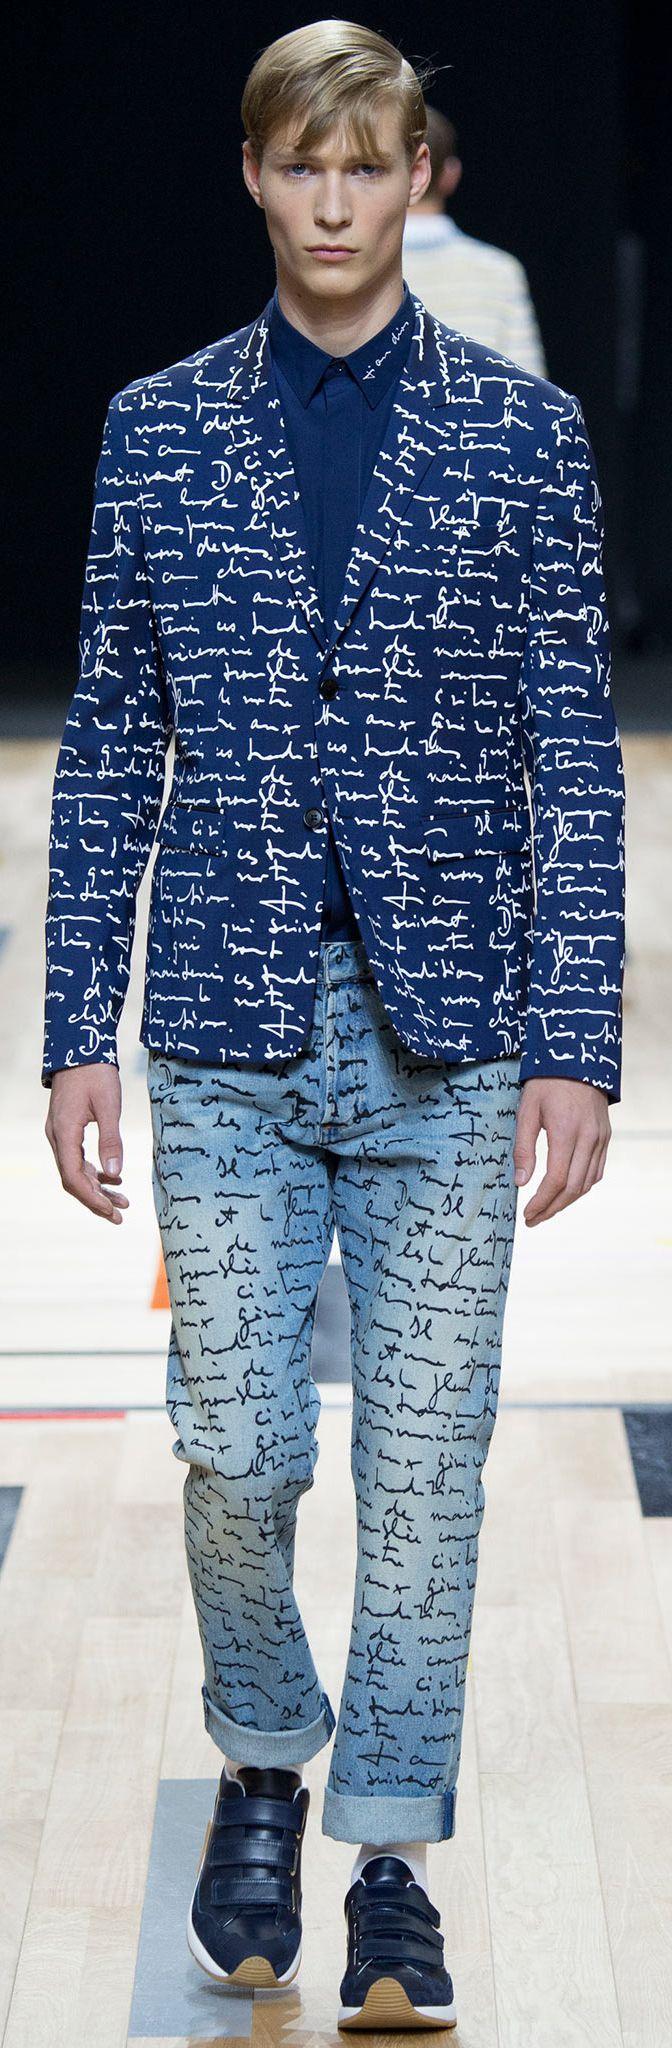 Dior Homme - Spring 2015 – handwriting print men's coat and pants